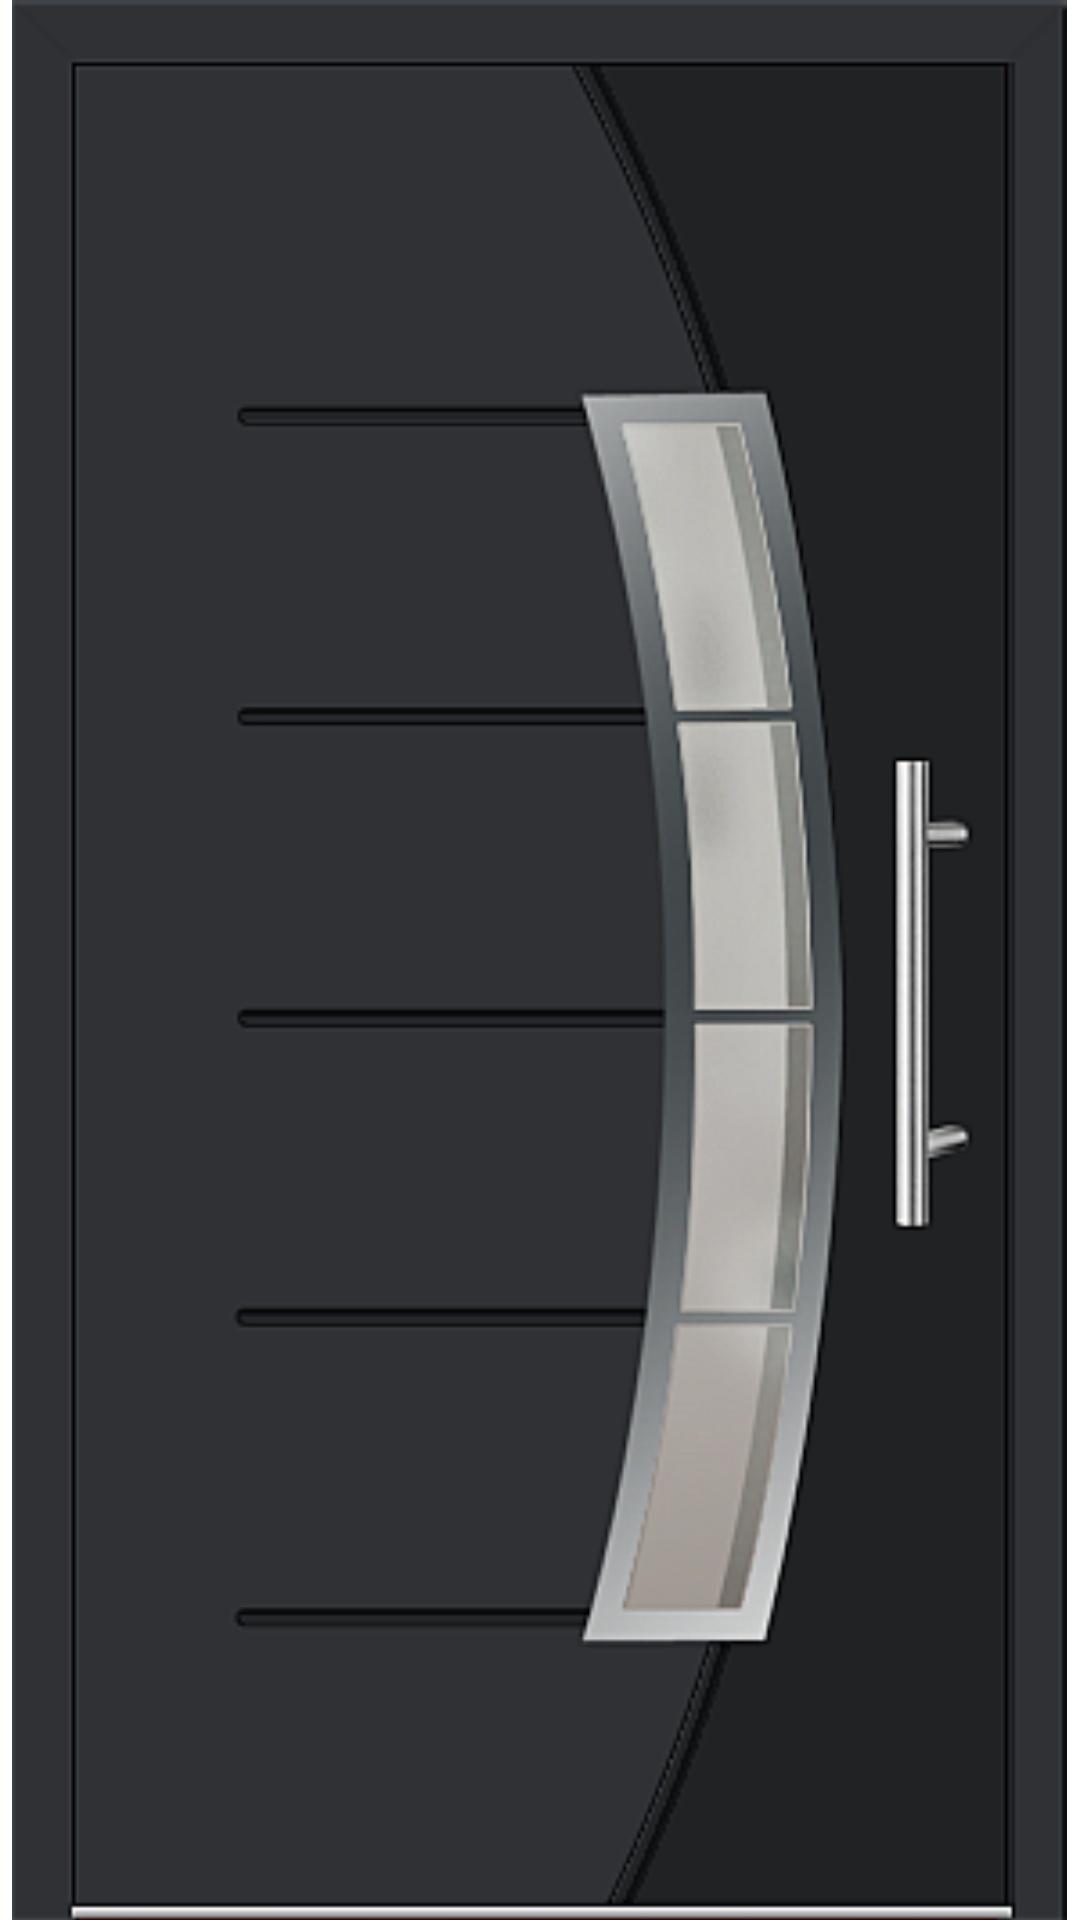 Aluminium Haustür Modell 6830-72 schwarz